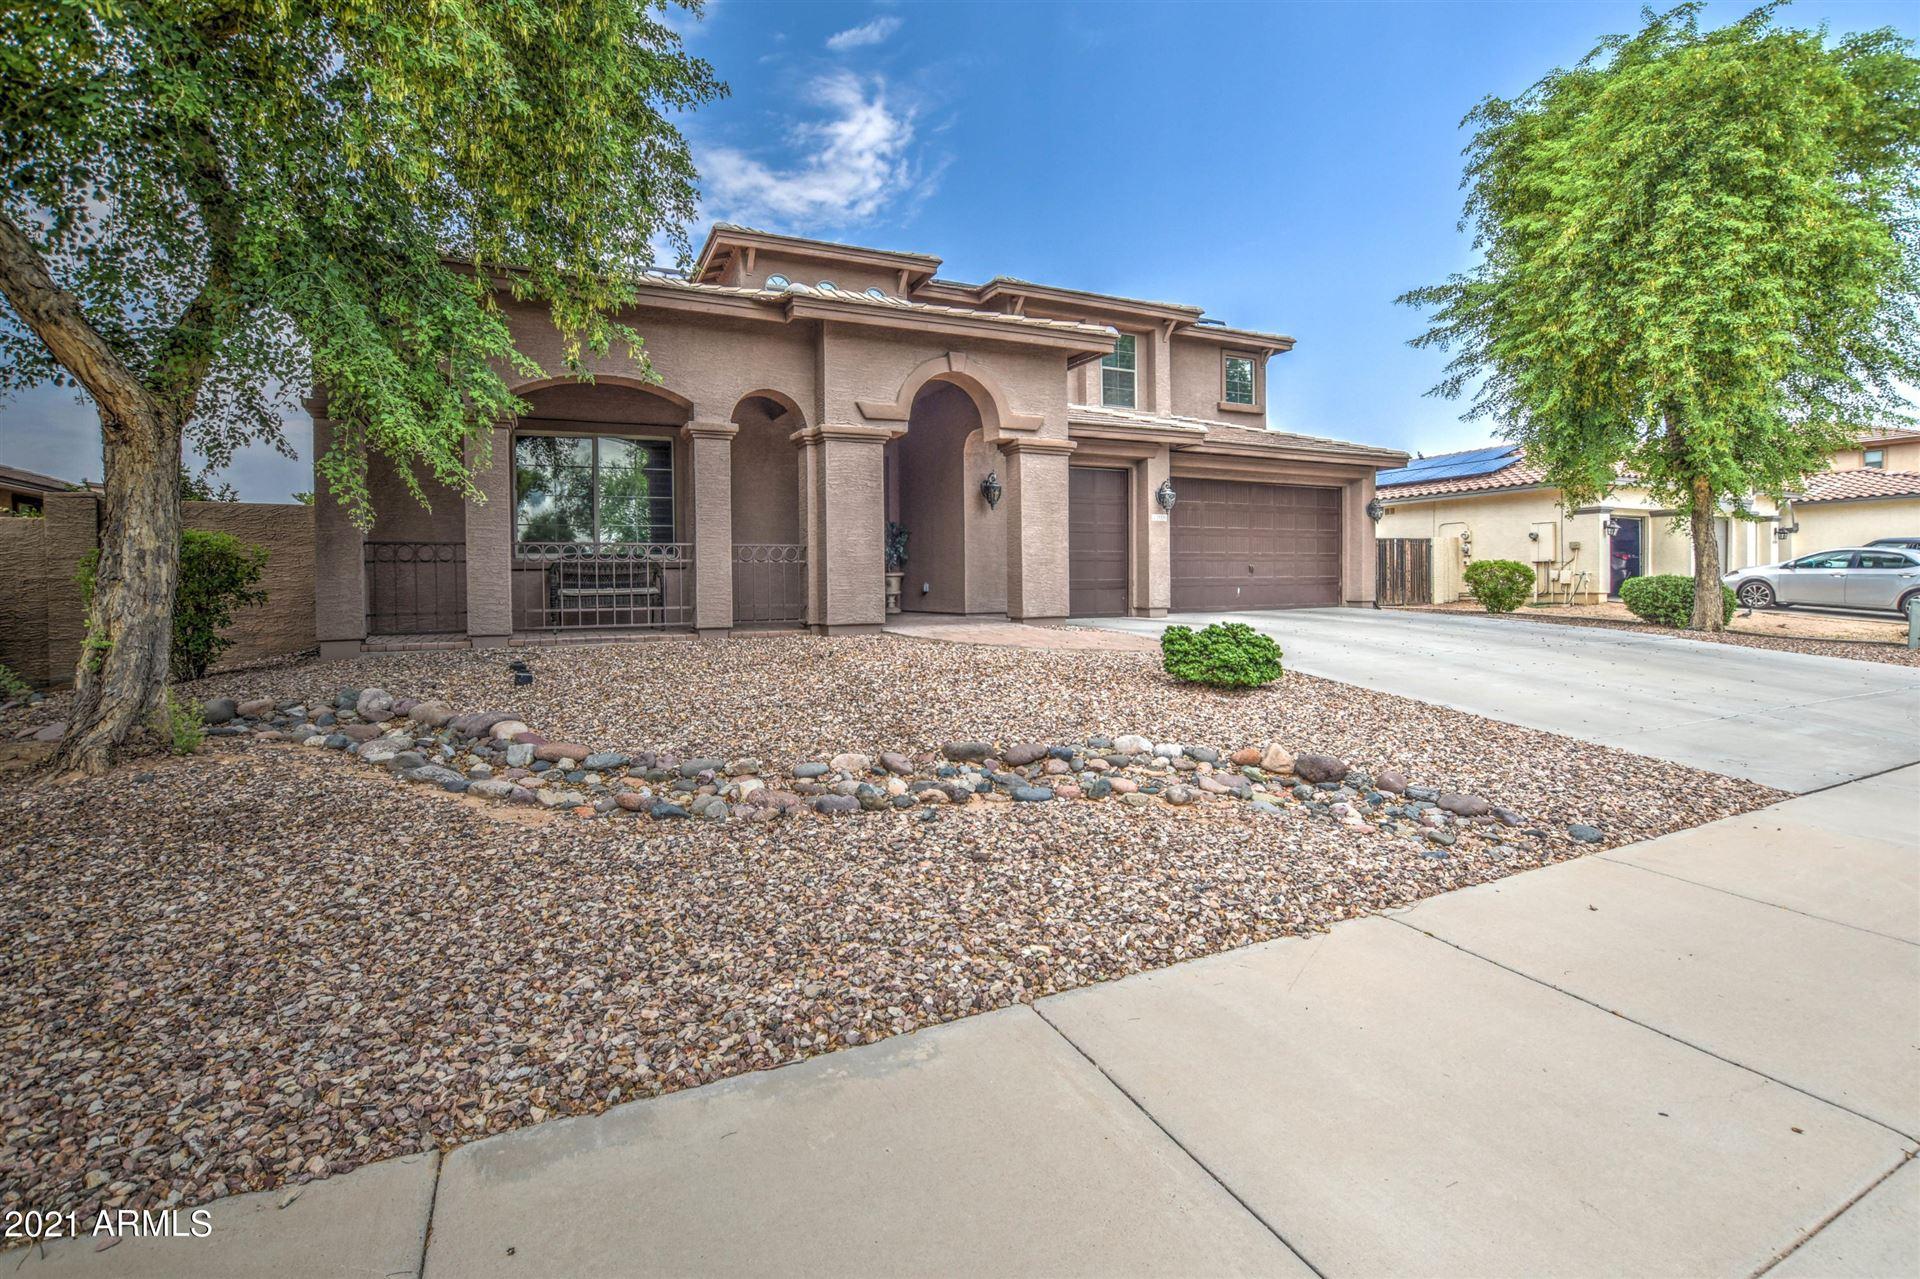 Photo of 15320 W COOLIDGE Street, Goodyear, AZ 85395 (MLS # 6268611)